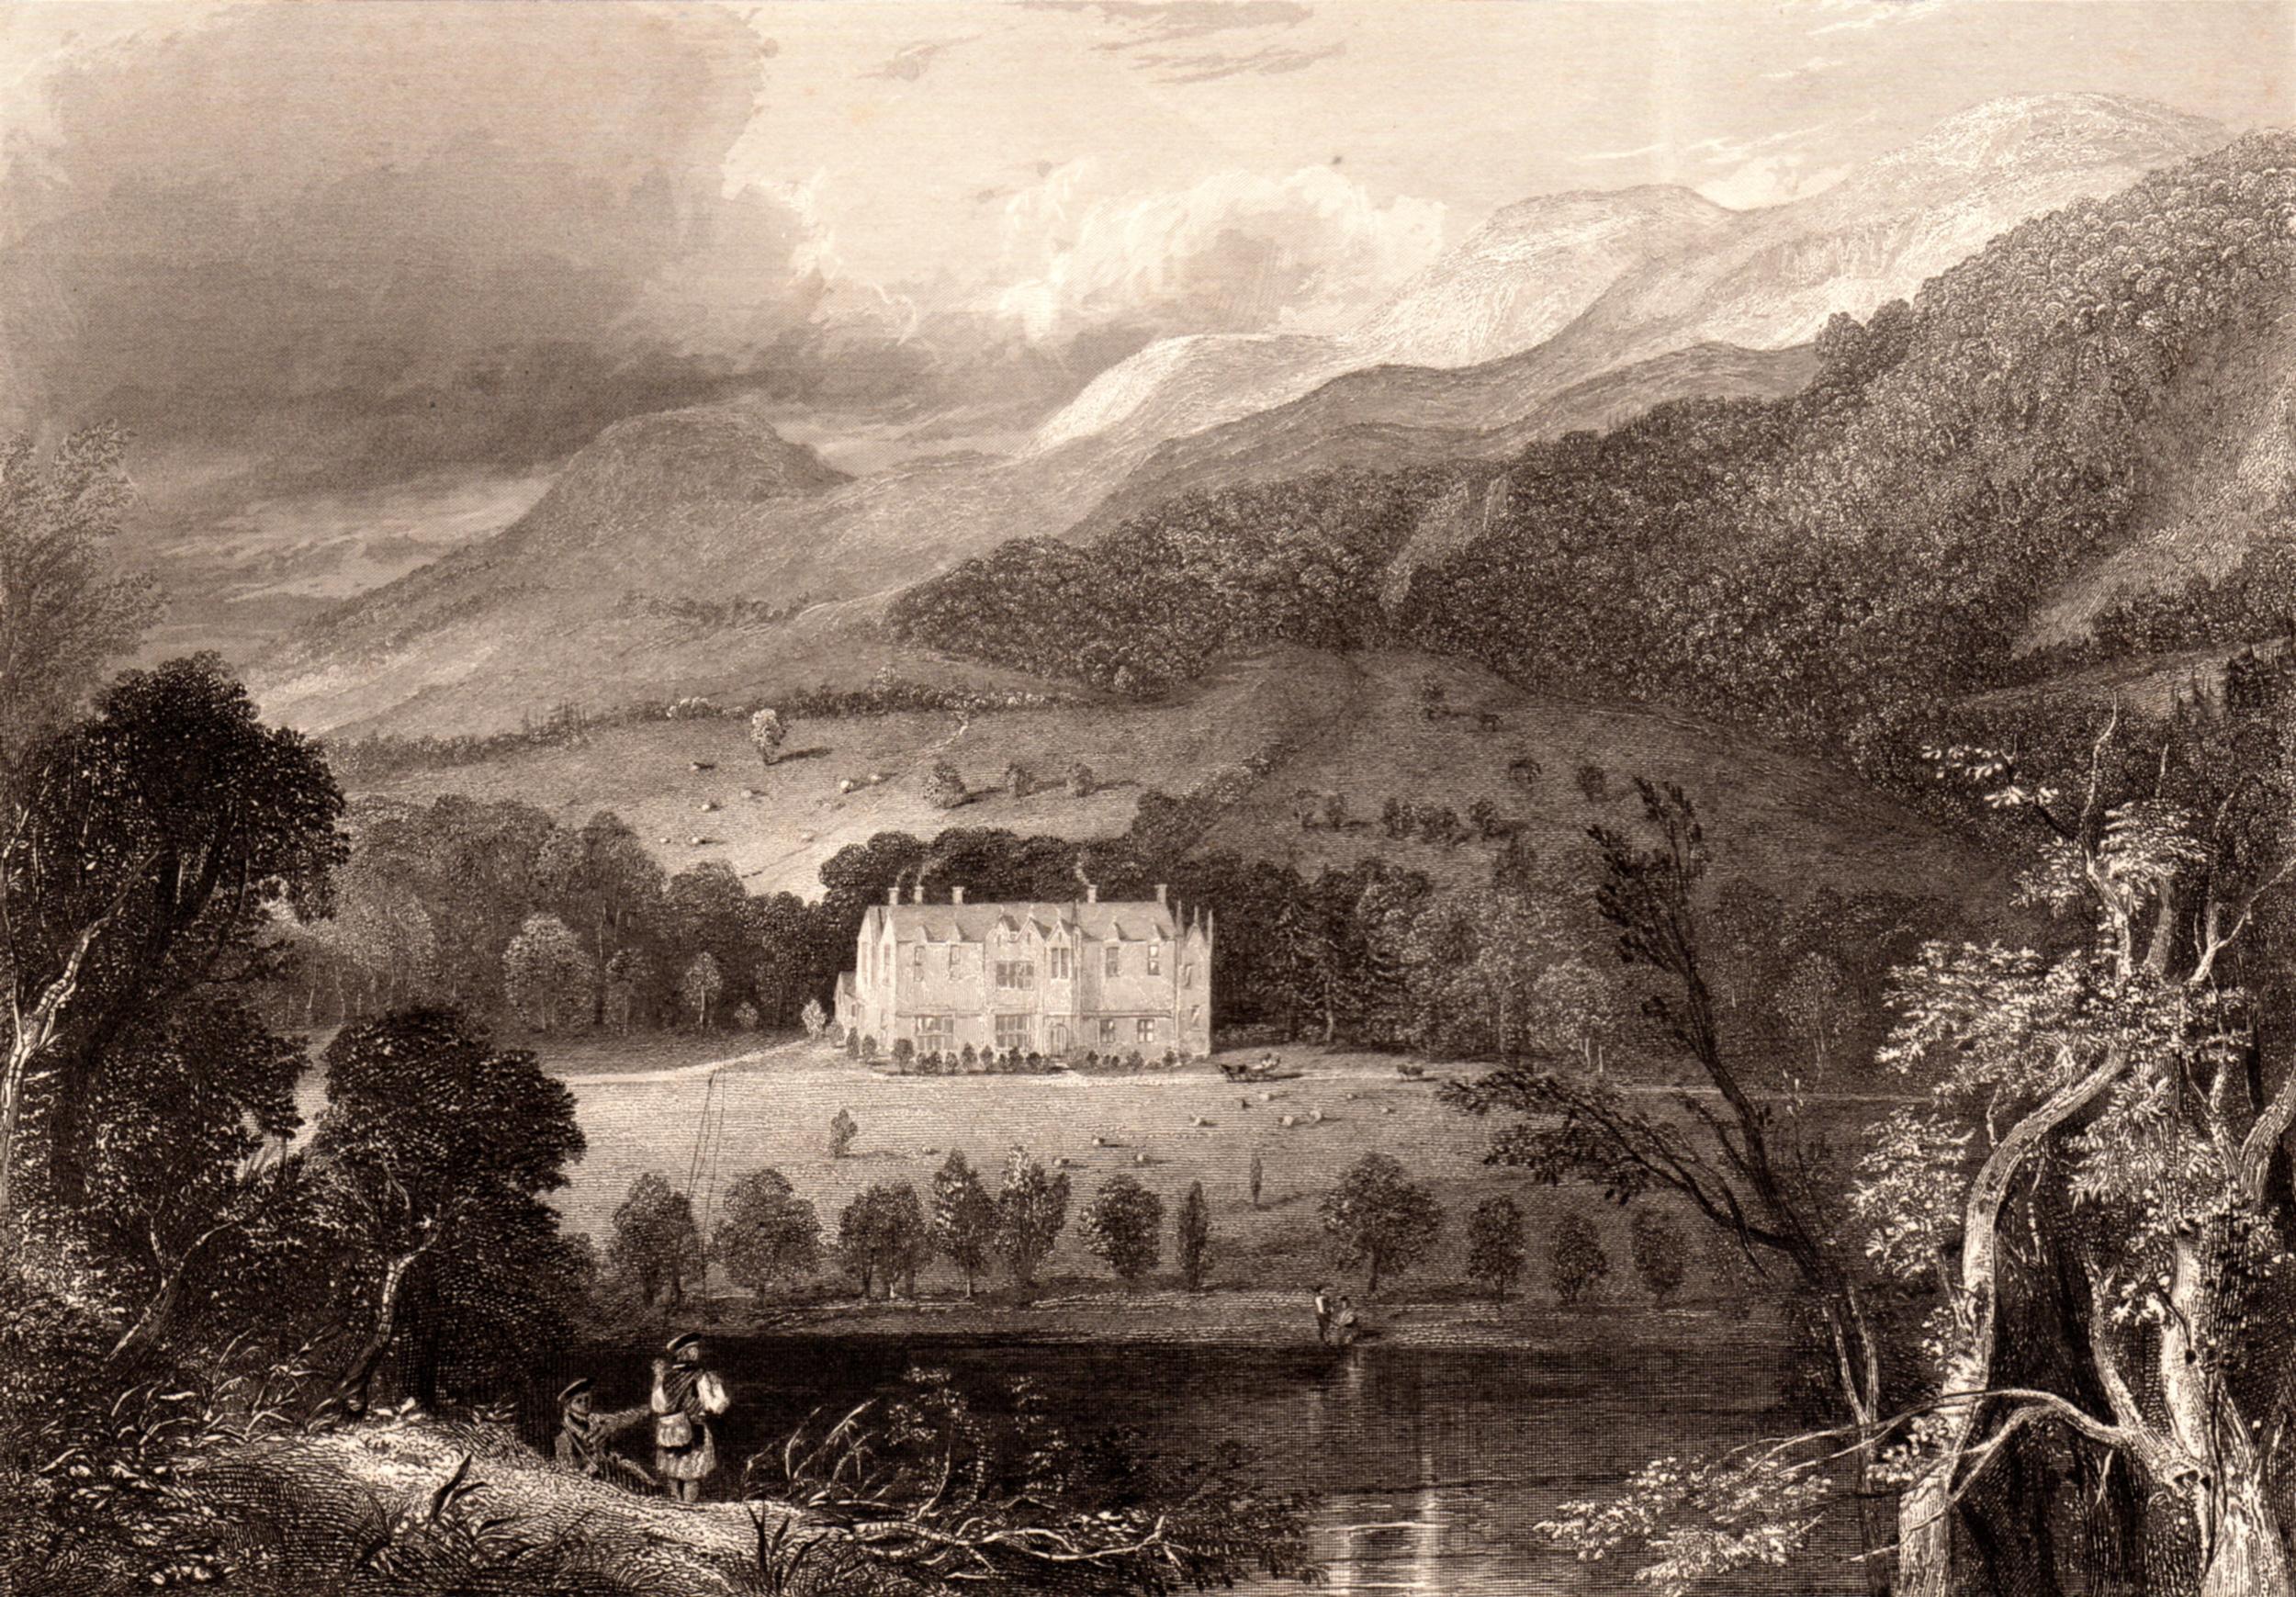 Hooker, Sir W.J. / Perthshire, Scotland